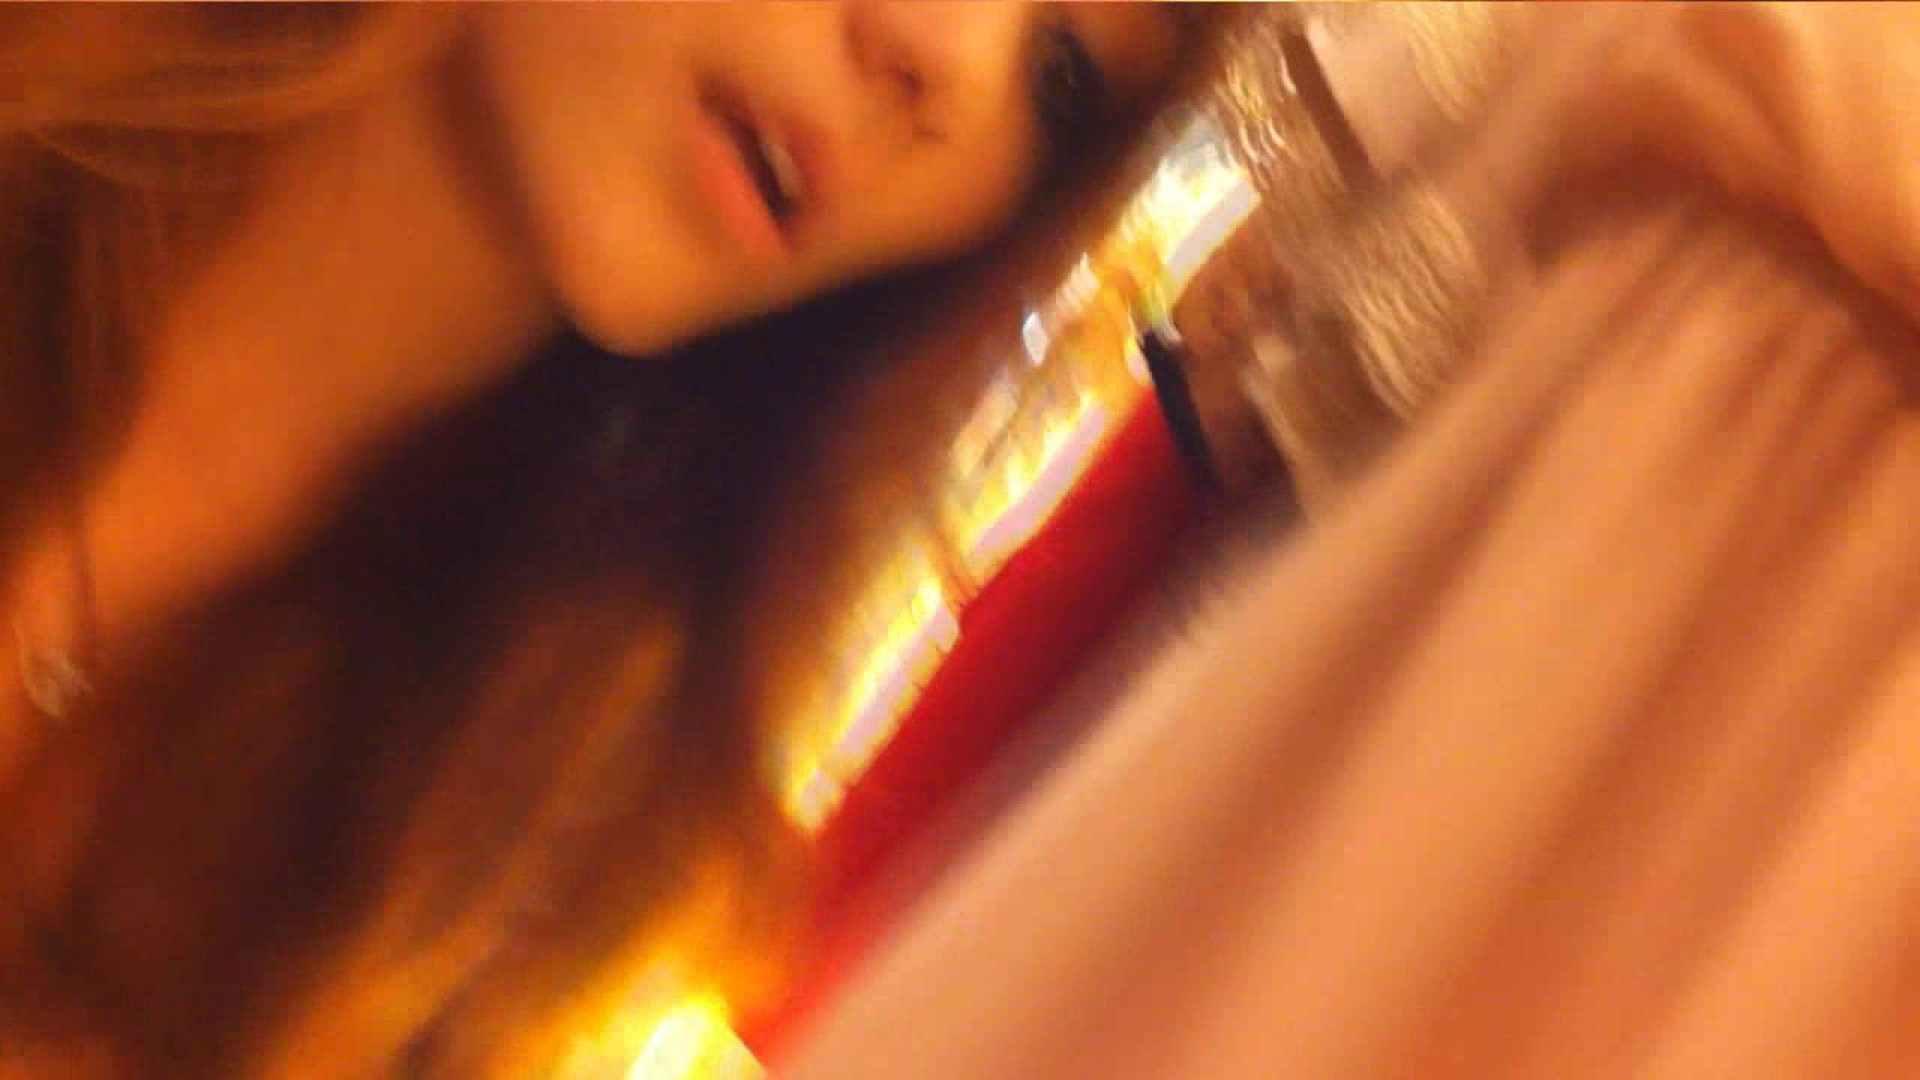 vol.35 美人アパレル胸チラ&パンチラ ひらひらスカートの中身は? 胸チラ SEX無修正画像 104画像 59